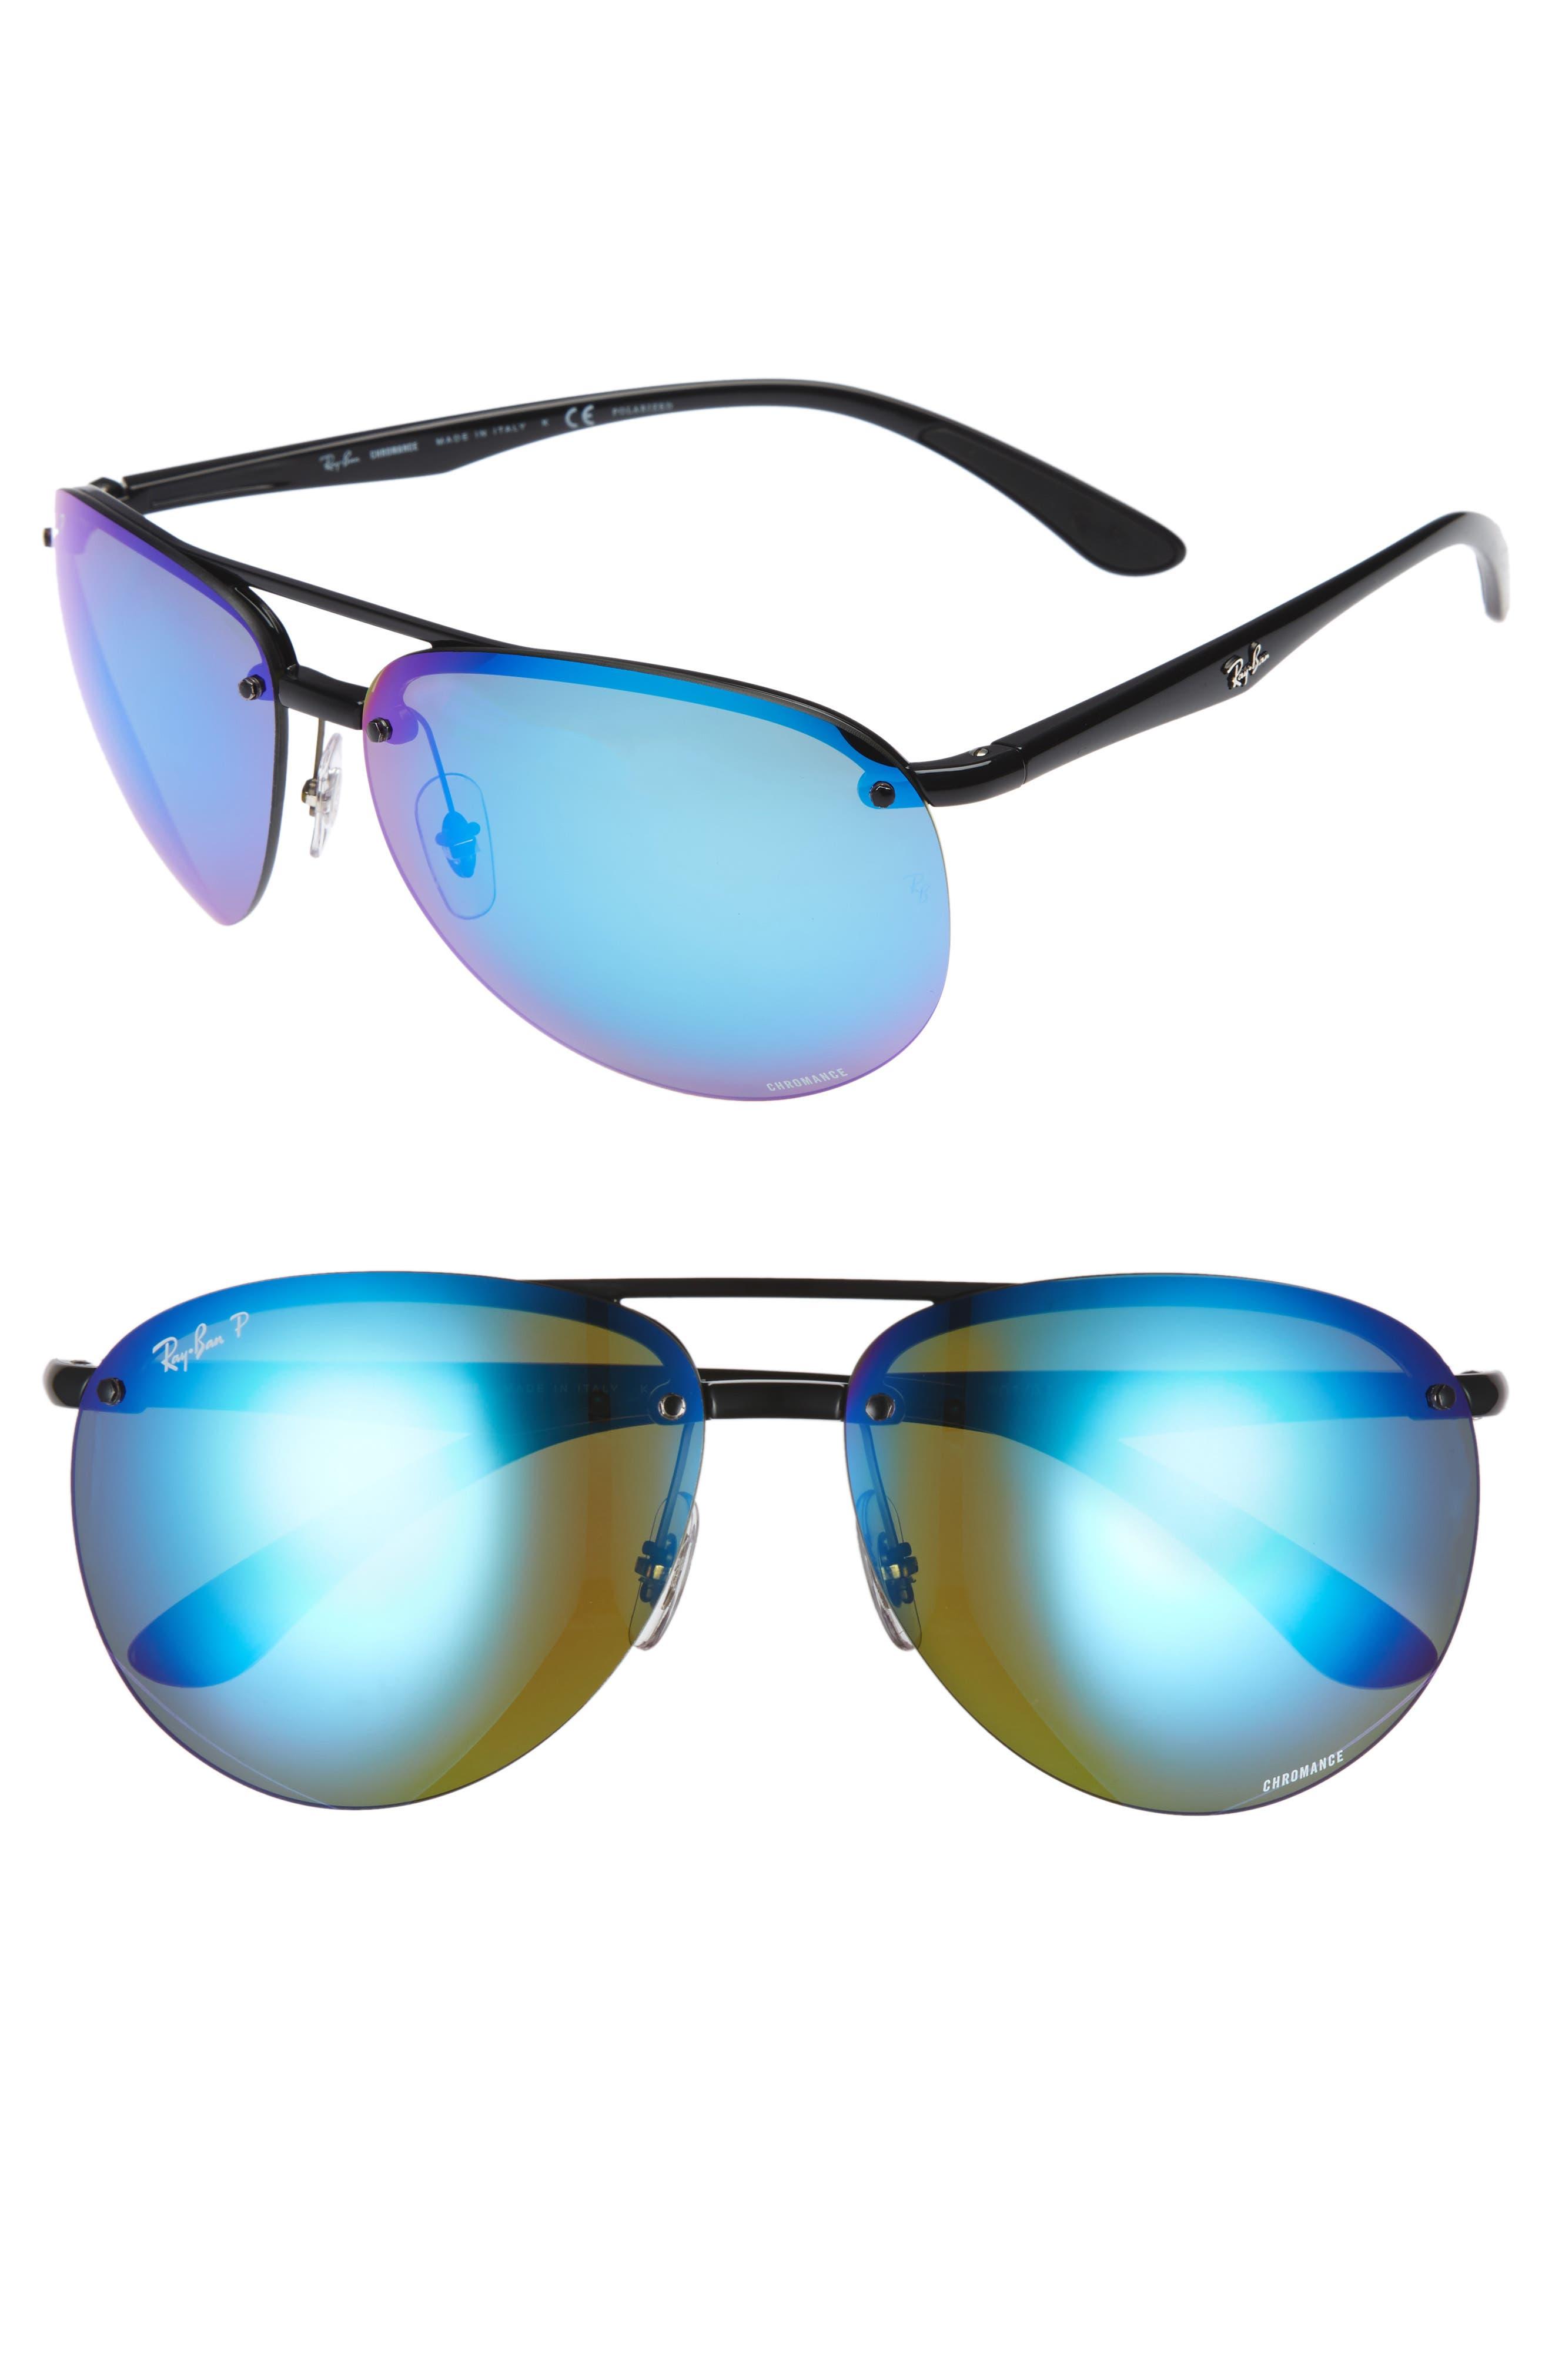 64mm Oversized Polarized Mirrored Rimless Aviator Sunglasses,                         Main,                         color, 001